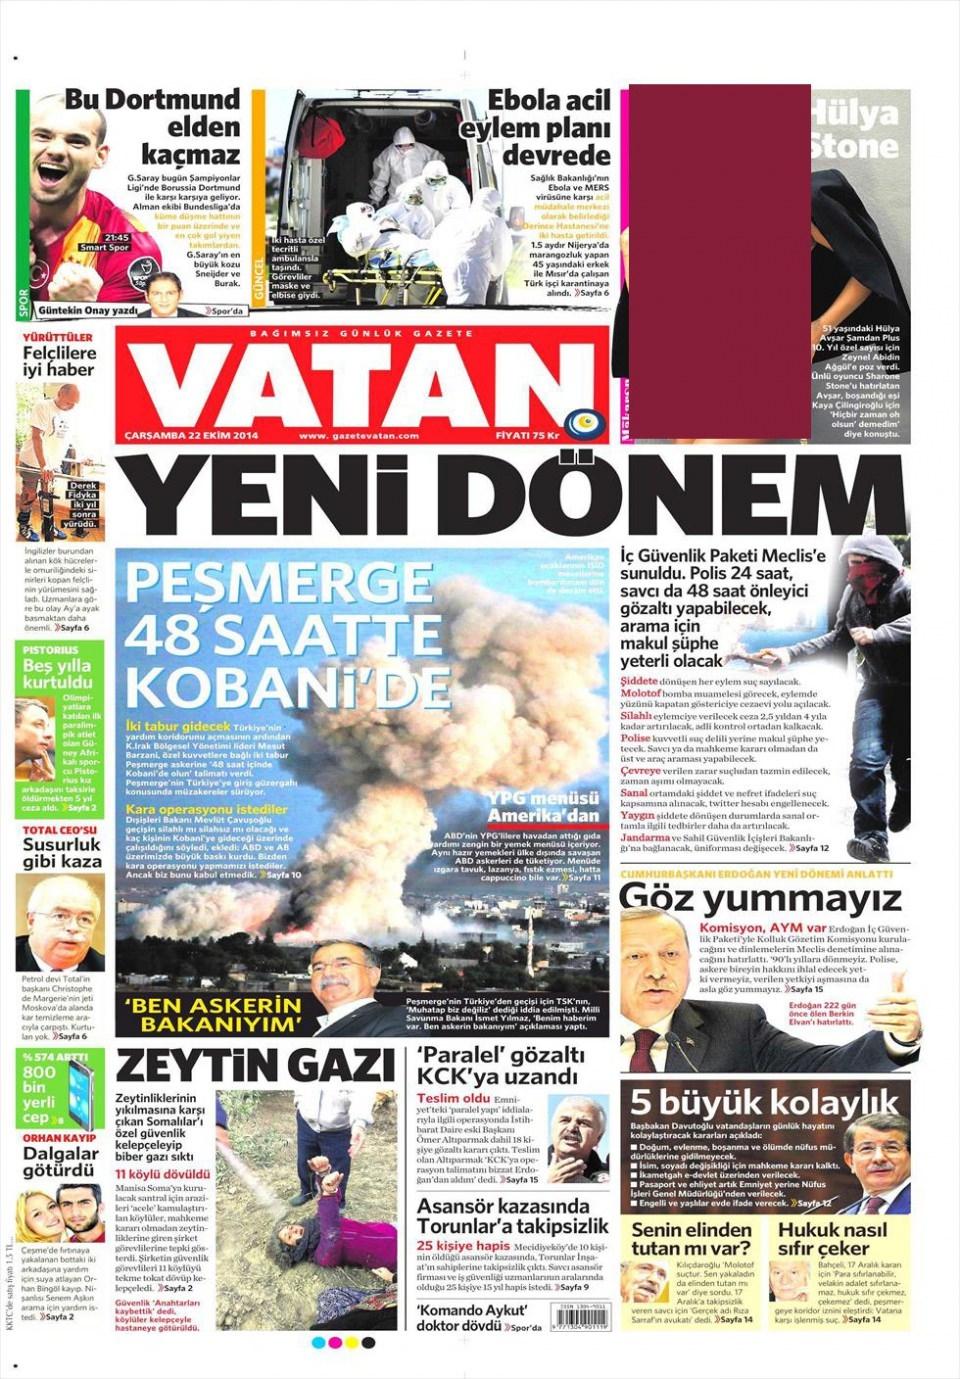 22 Ekim 2014 gazete manşetleri 21